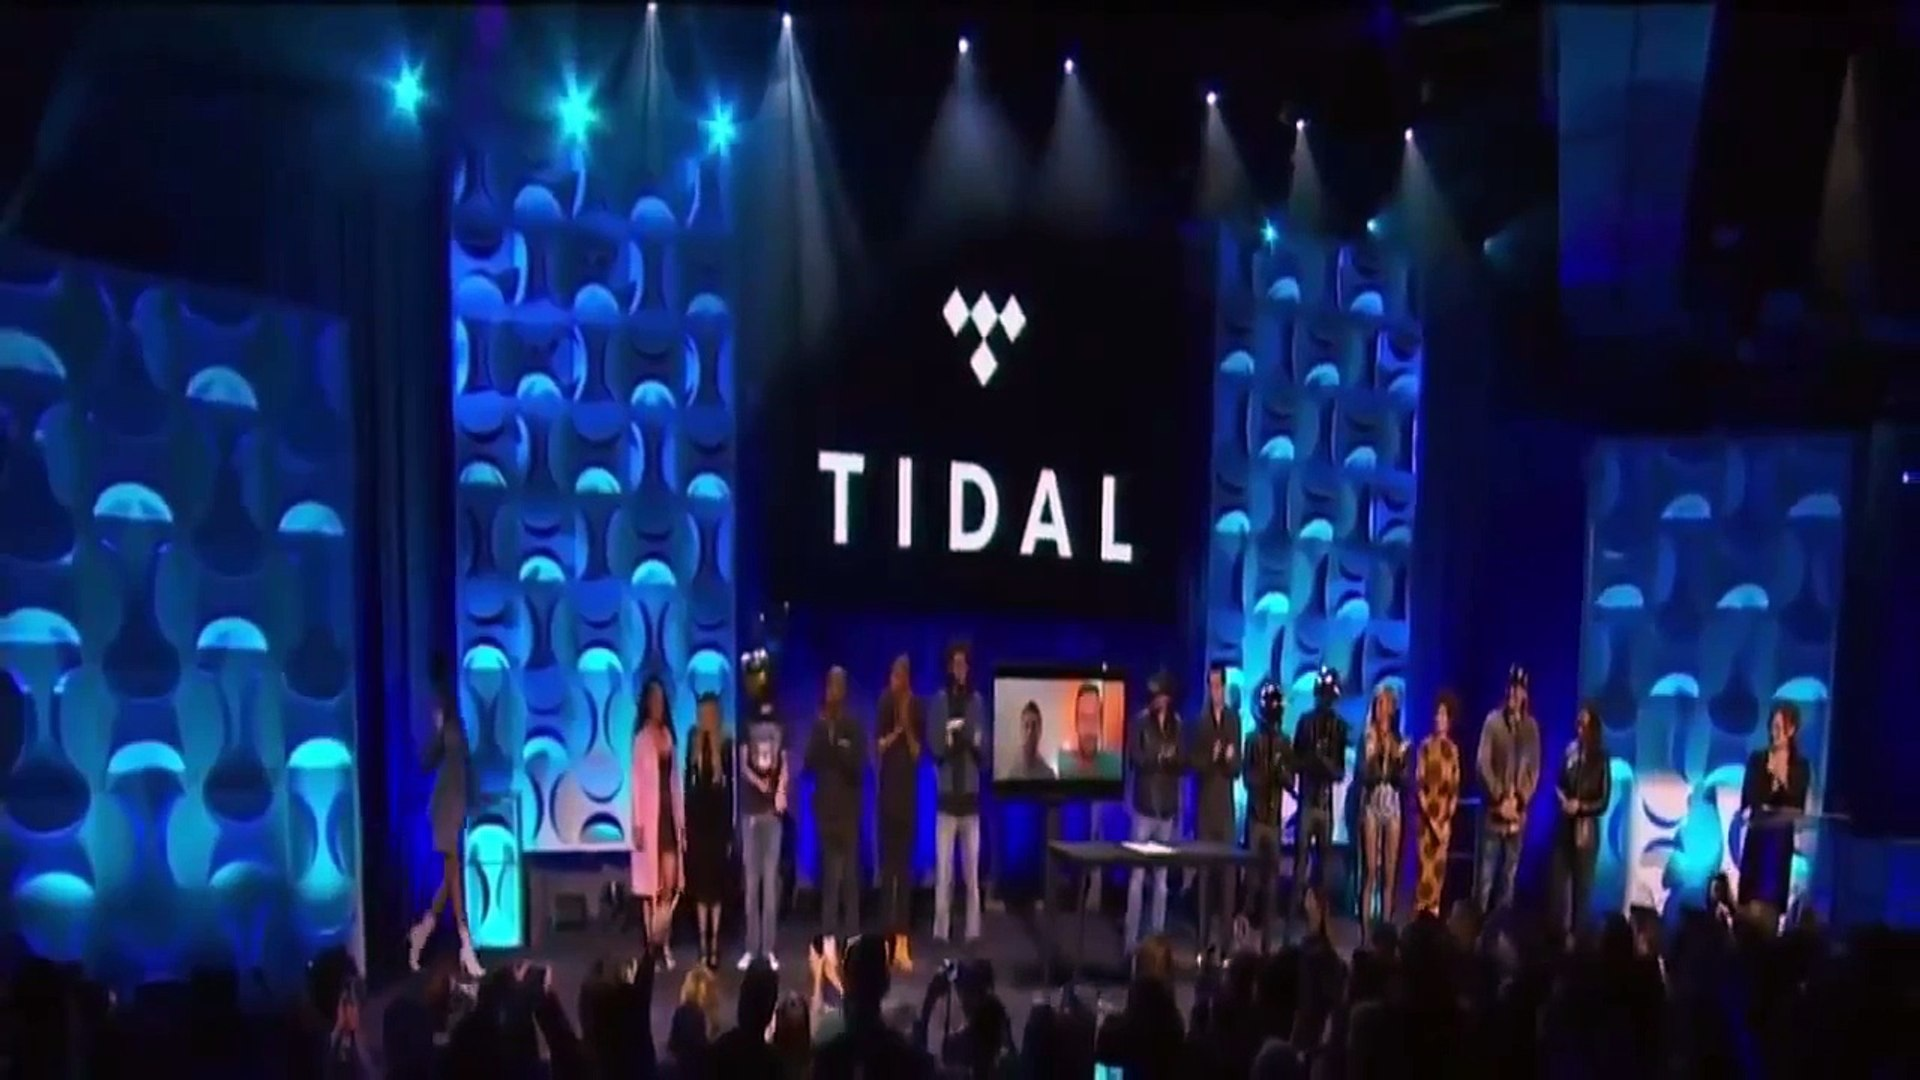 Beyoncé, Rihanna, Nicki Minaj, Madonna, Usher, Calvin Harris in Tidal Press Conference 2015 #tidal